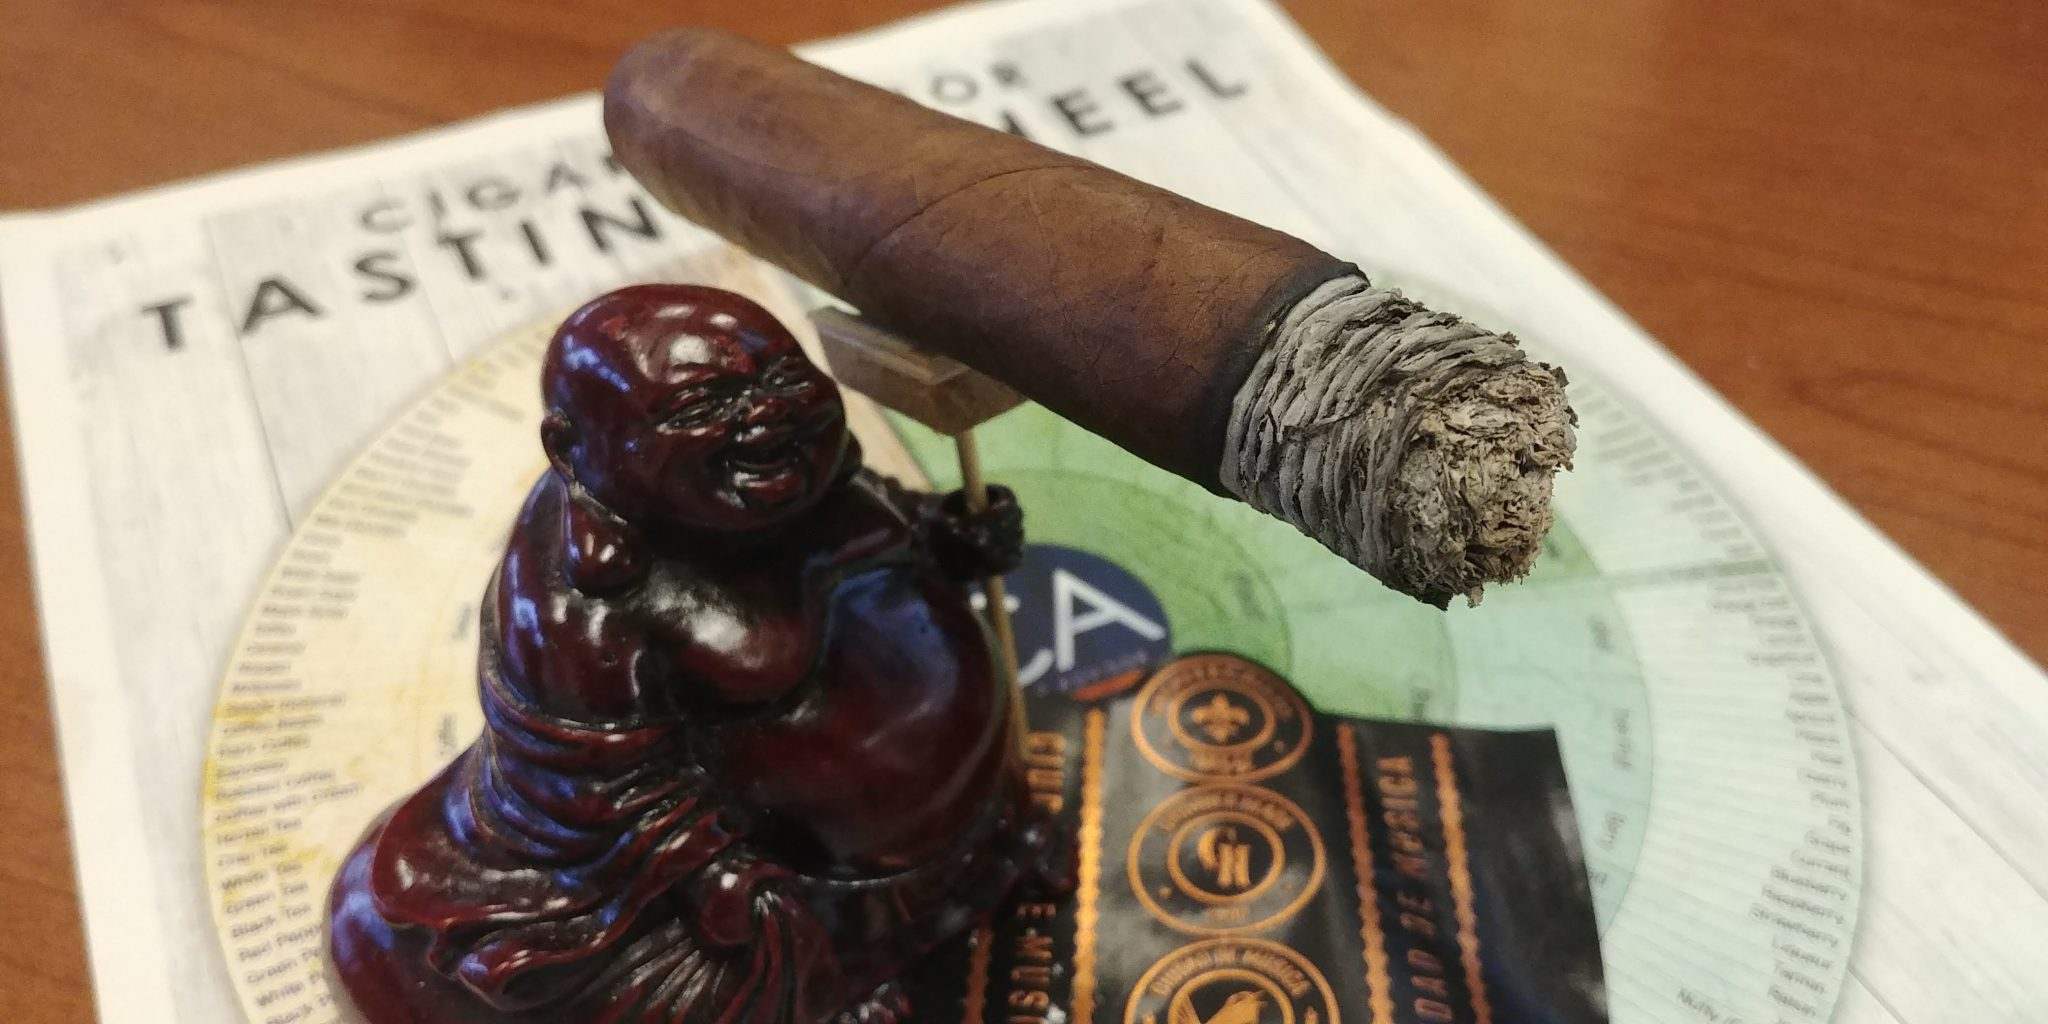 Montecristo Cigars Guide - Montecristo Ciudad de Musica Cigar Review - John Pullo